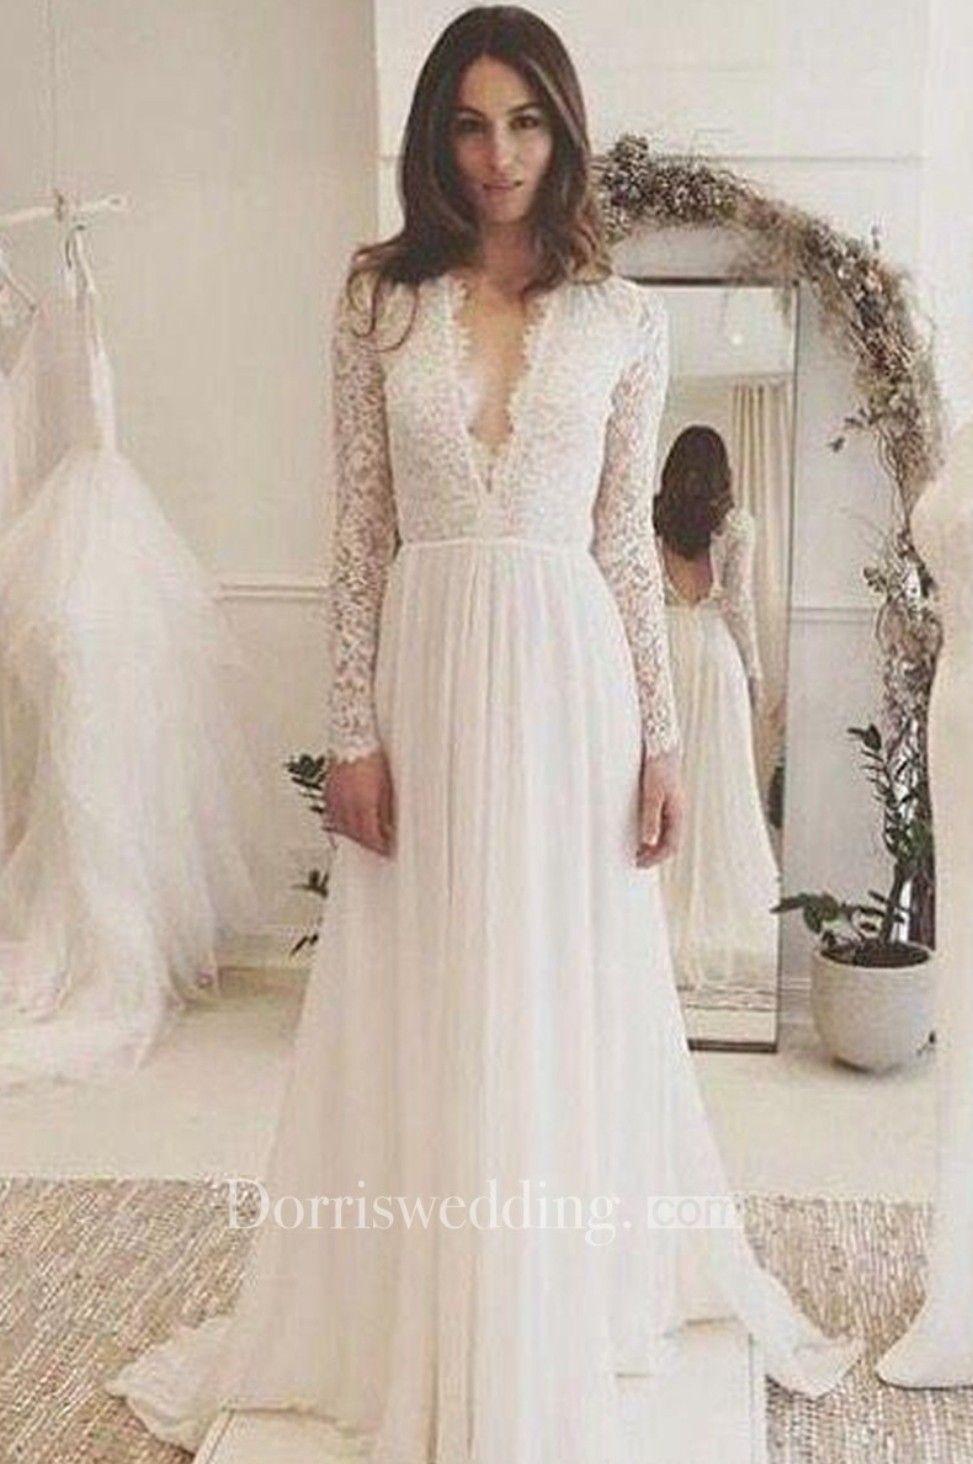 Boho wedding dress with sleeves  Vneck Long Sleeves Backless Ivory Chiffon Wedding Dress with Lace